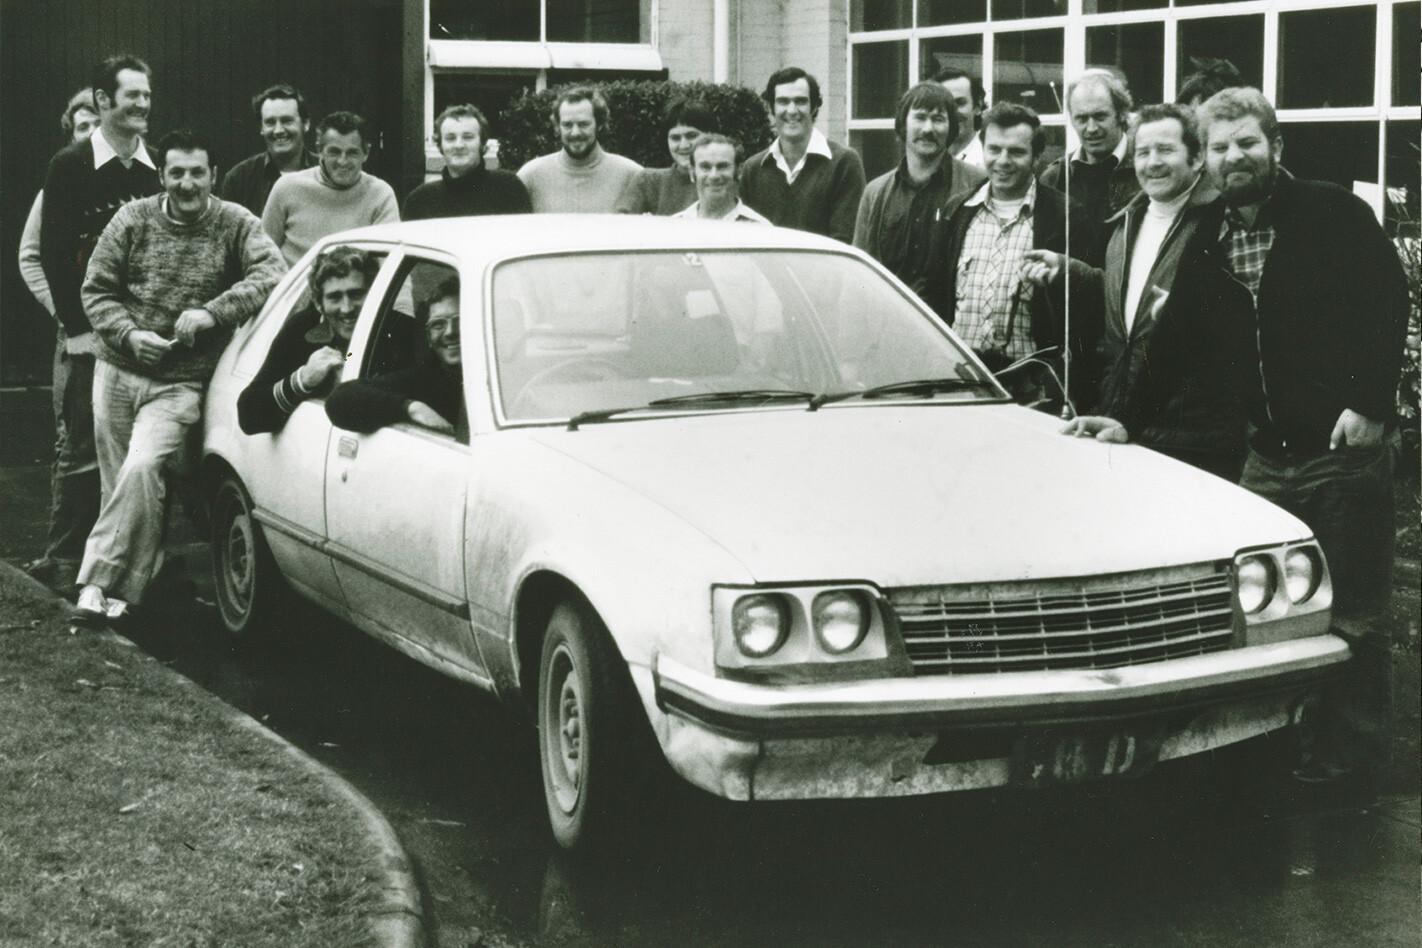 VB Commodore Car Of The Year Team Jpg